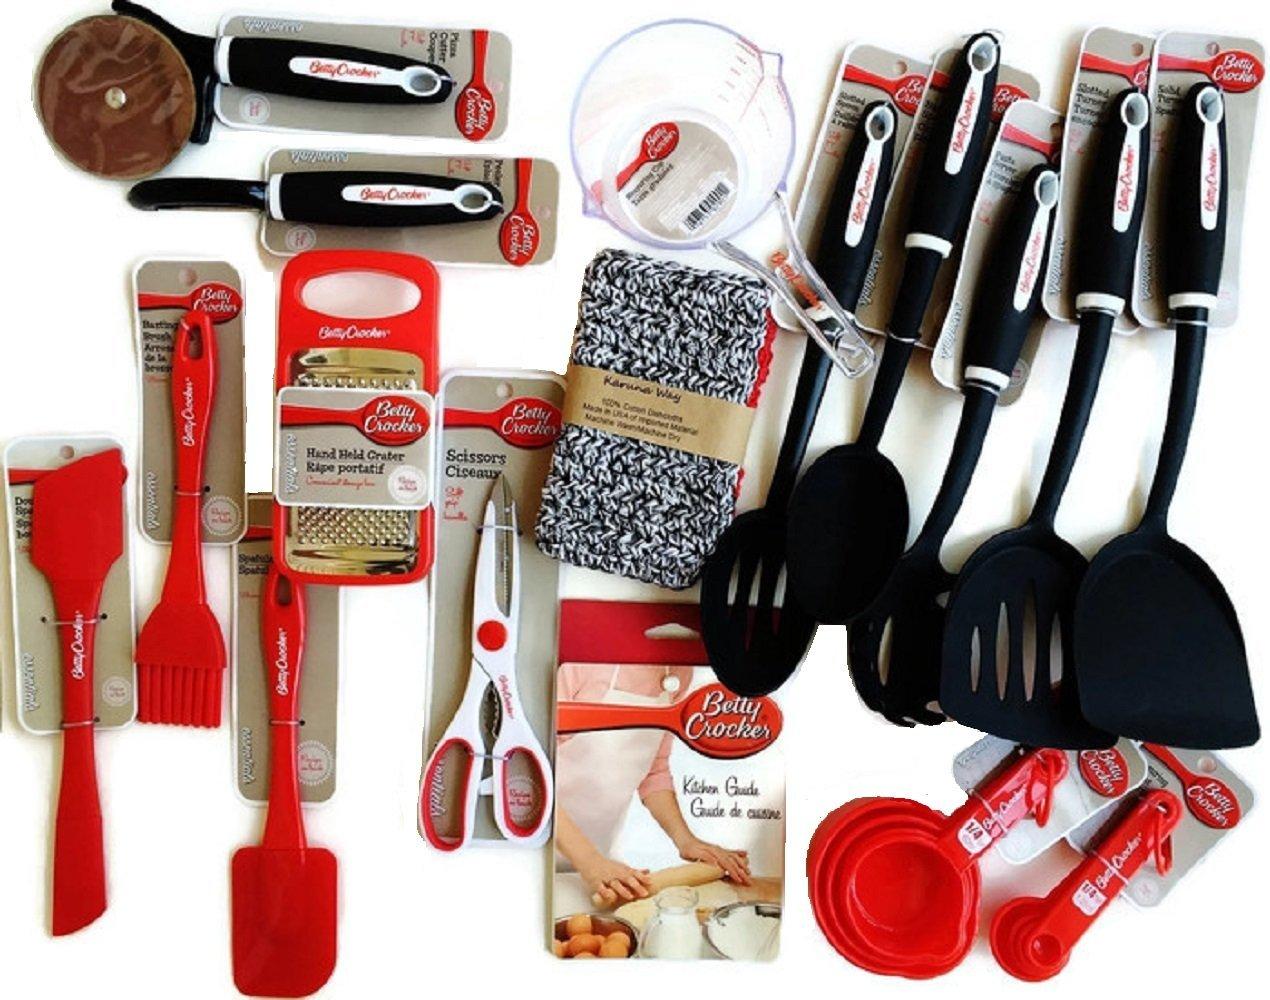 Betty Crocker Kitchen Gadgets, Cooking Utensils, Tools, Supplies, Essentials with Recipes, Hand-Made Cotton Dish Cloths and BONUS Betty Crocker Cake Tester, 18-piece Set